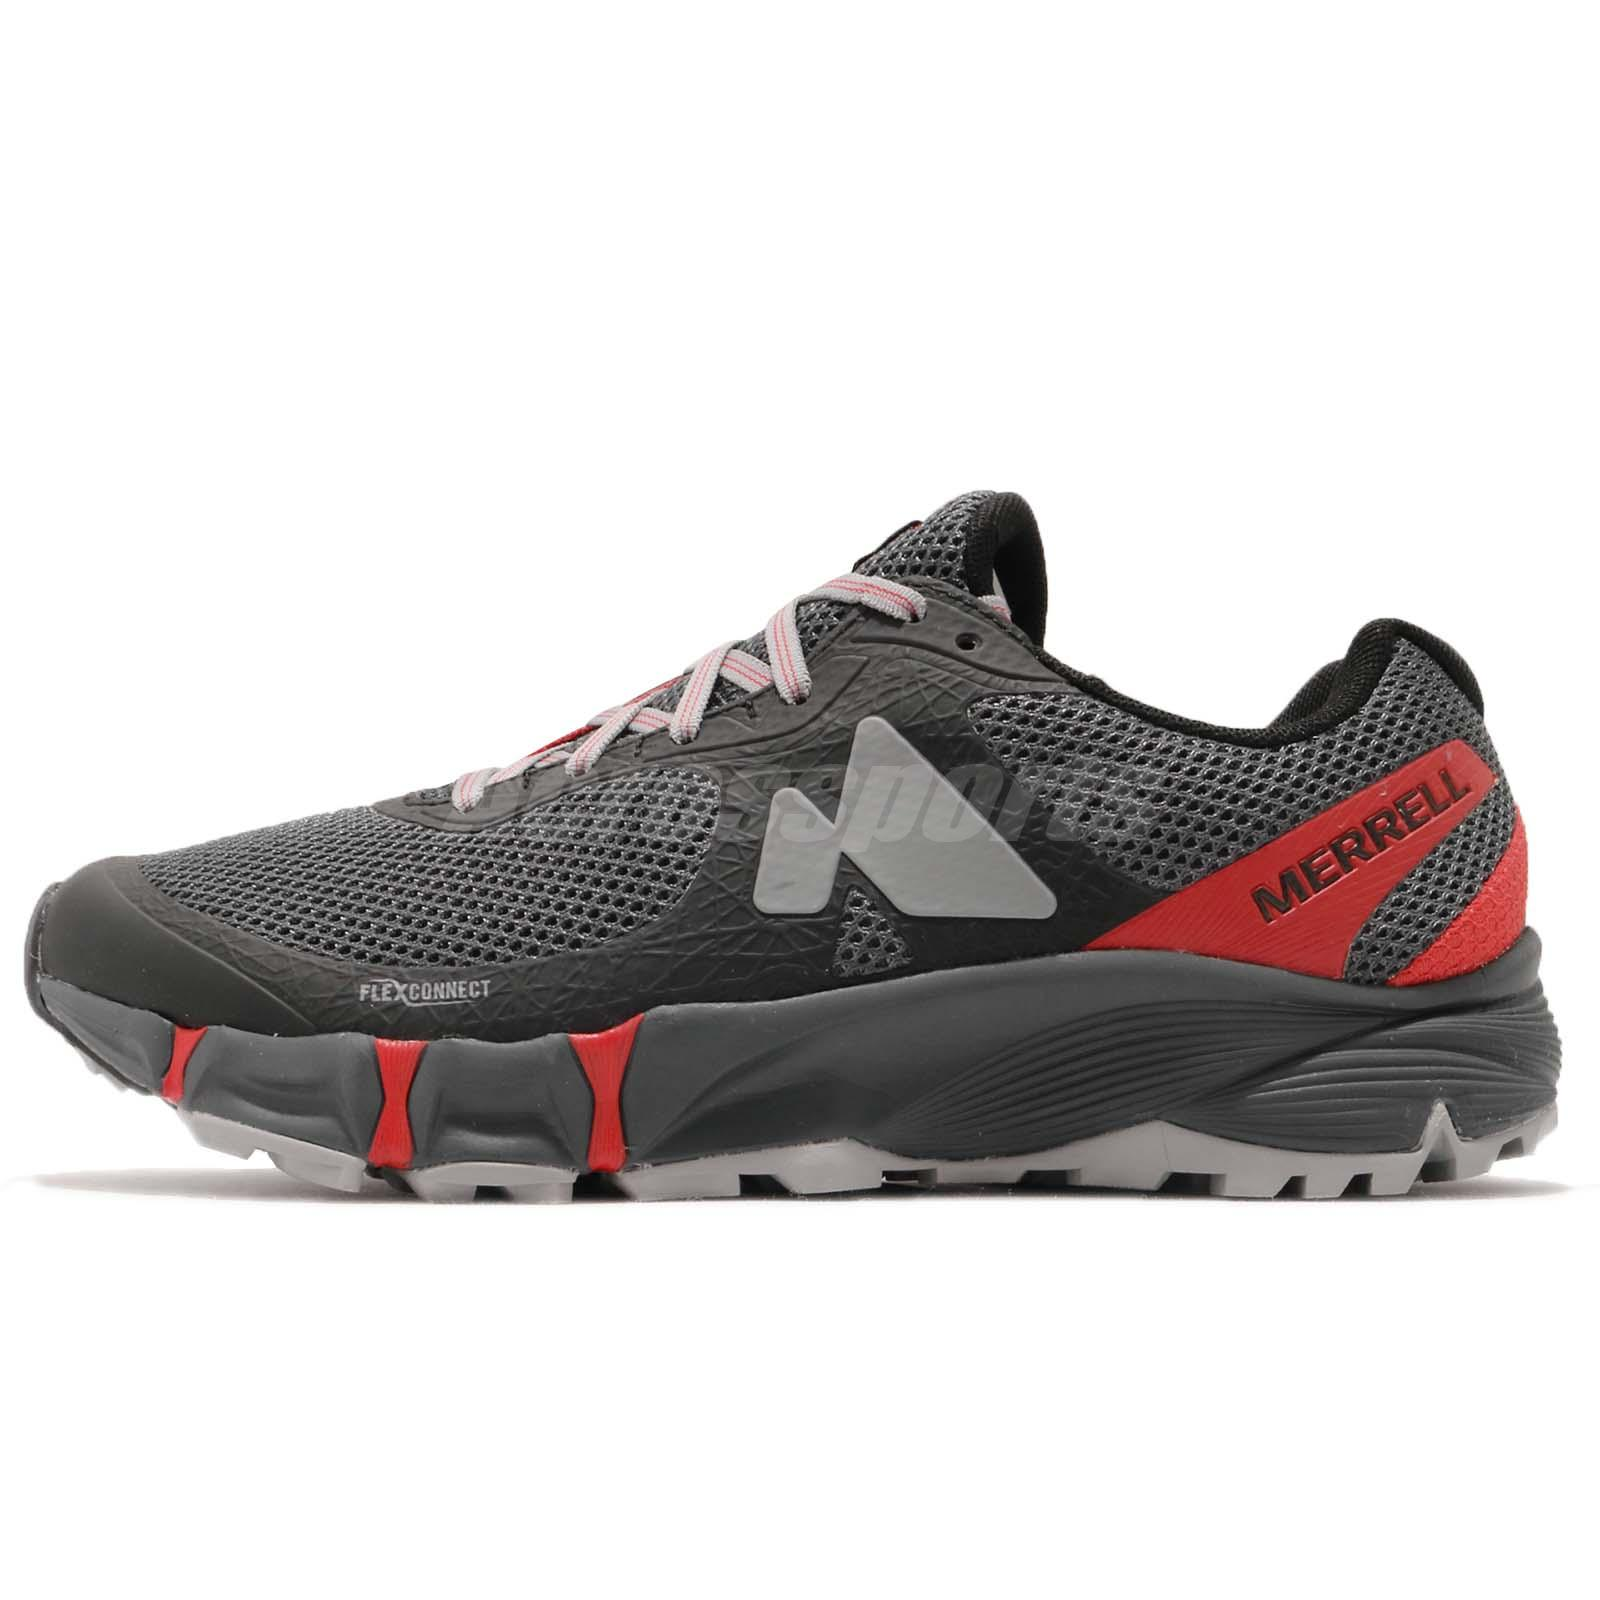 Black J37698 Merrell Agility Peak Flex Shoes Women/'s